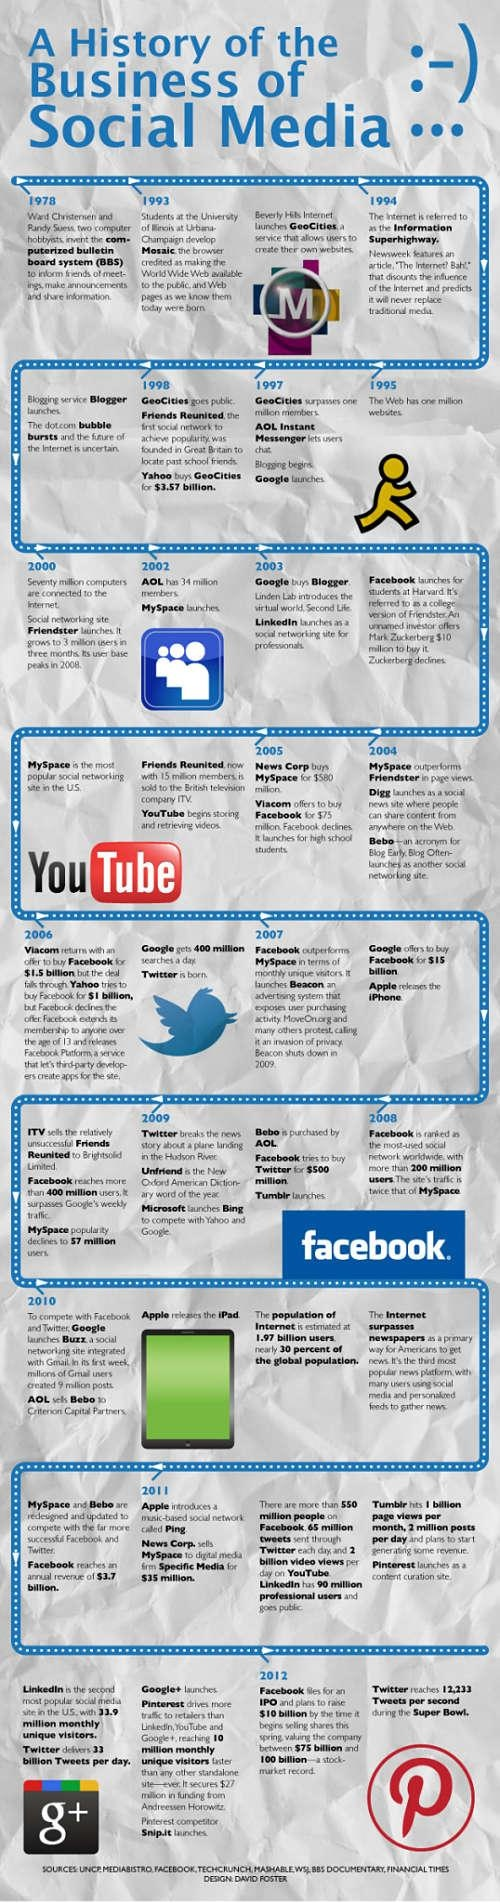 Infografía: historia de las empresas de redes sociales  Infographic: a history of the Business of Socail Media